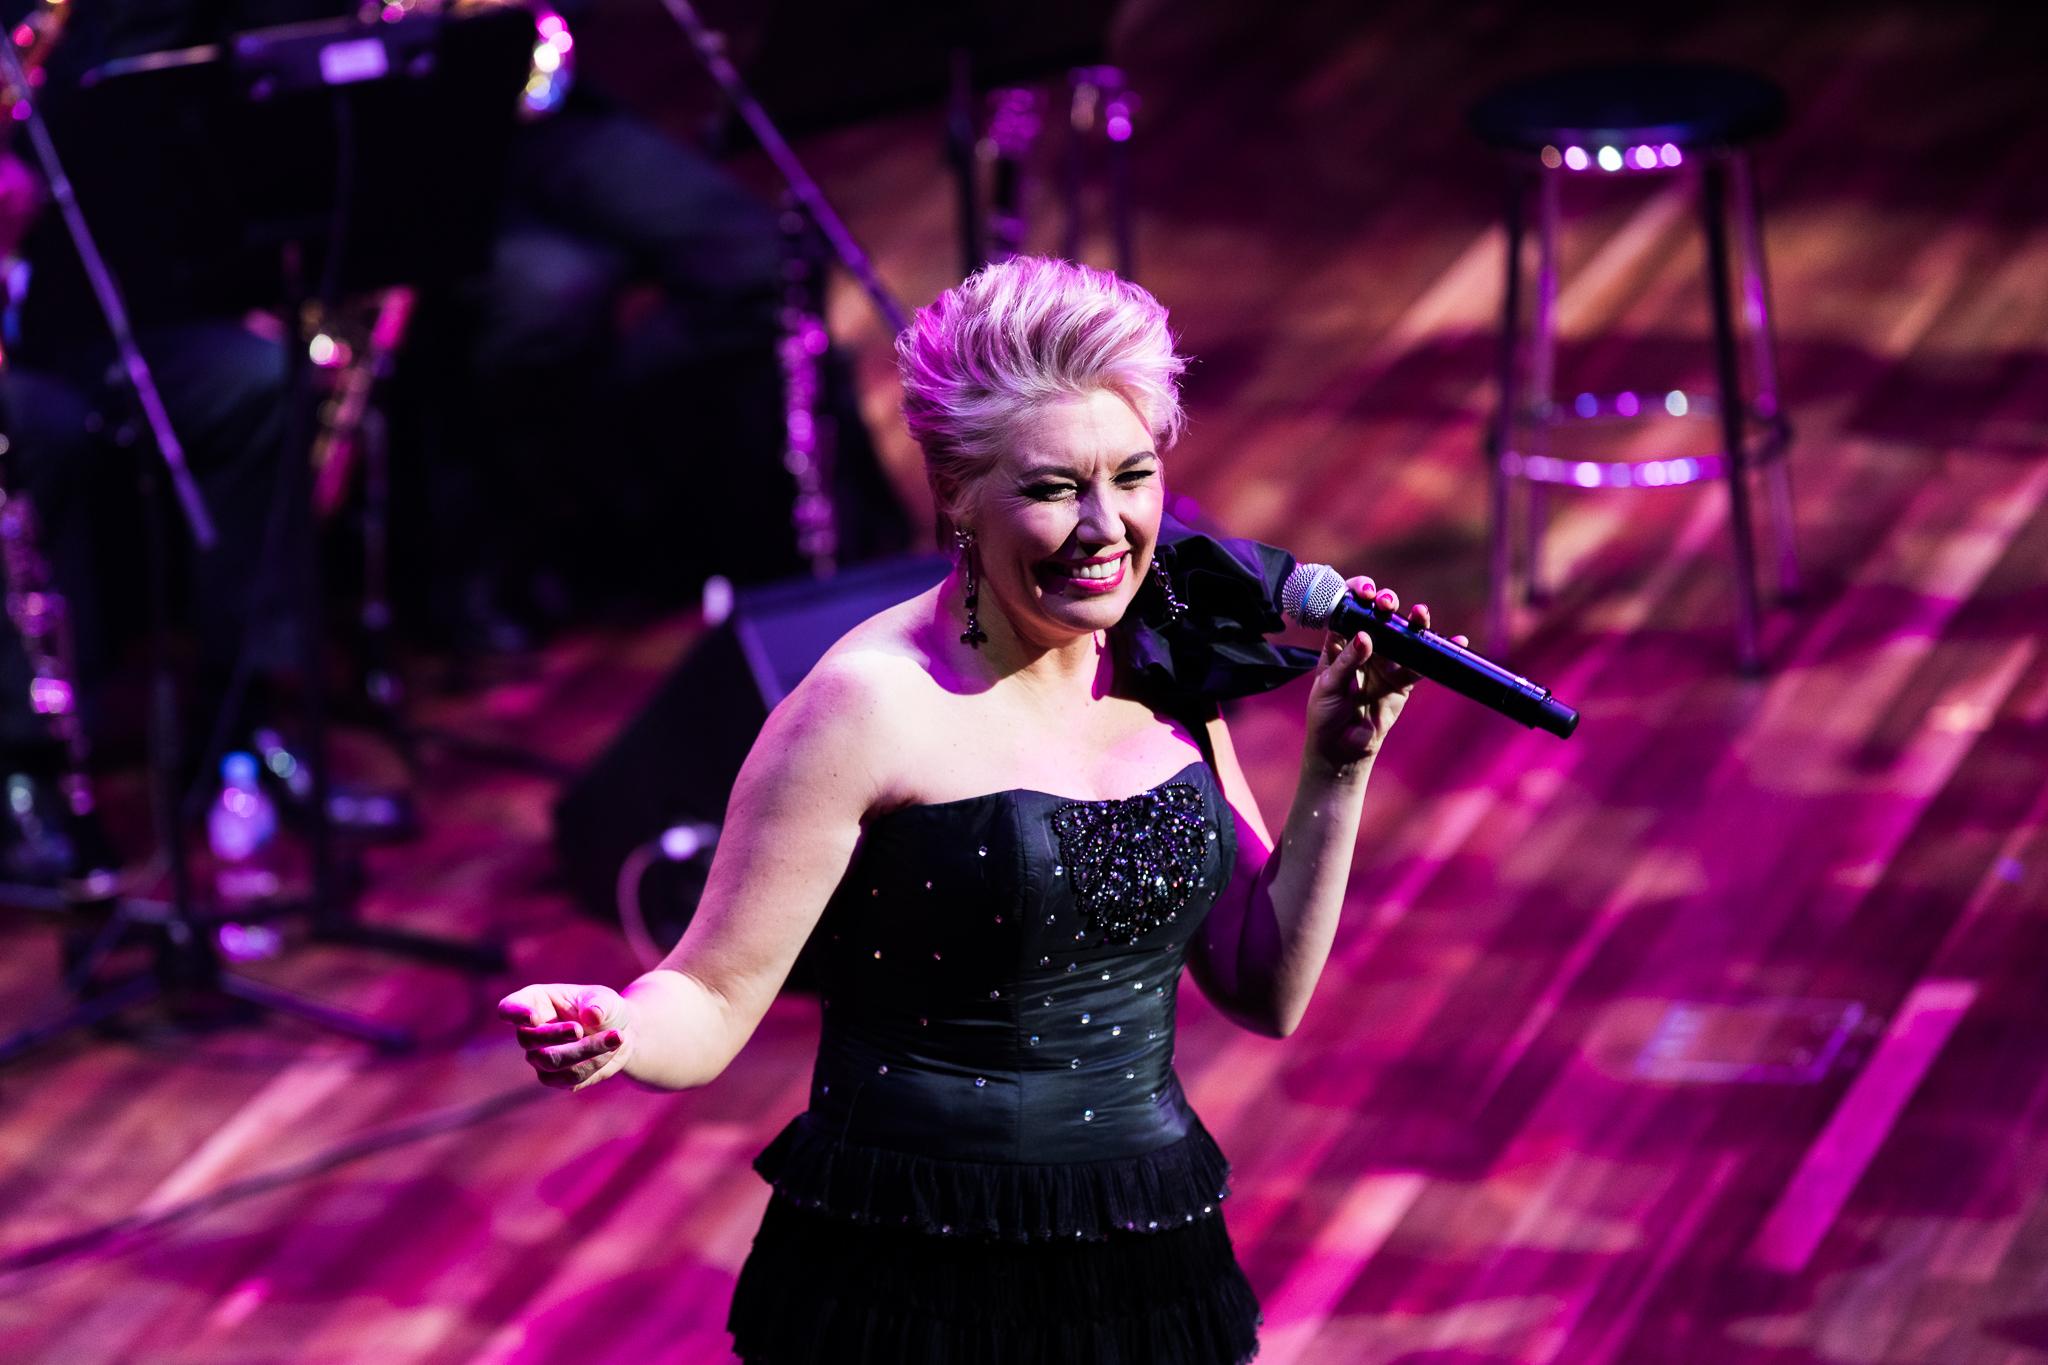 Melinda Schneider singing and dancing on stage